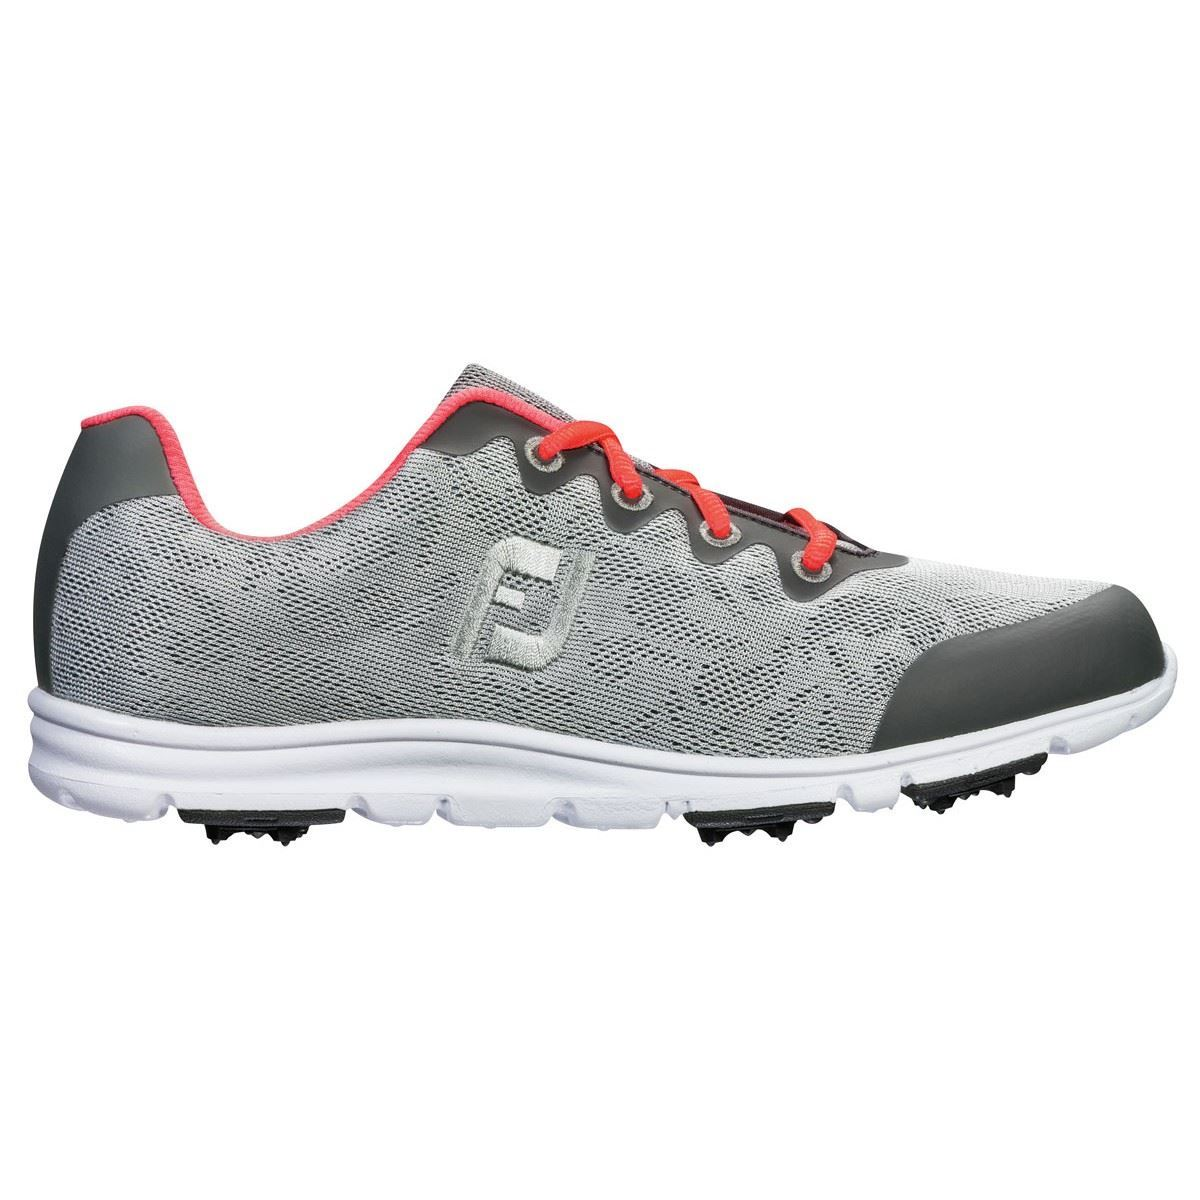 footjoy womens empower boa golf shoes